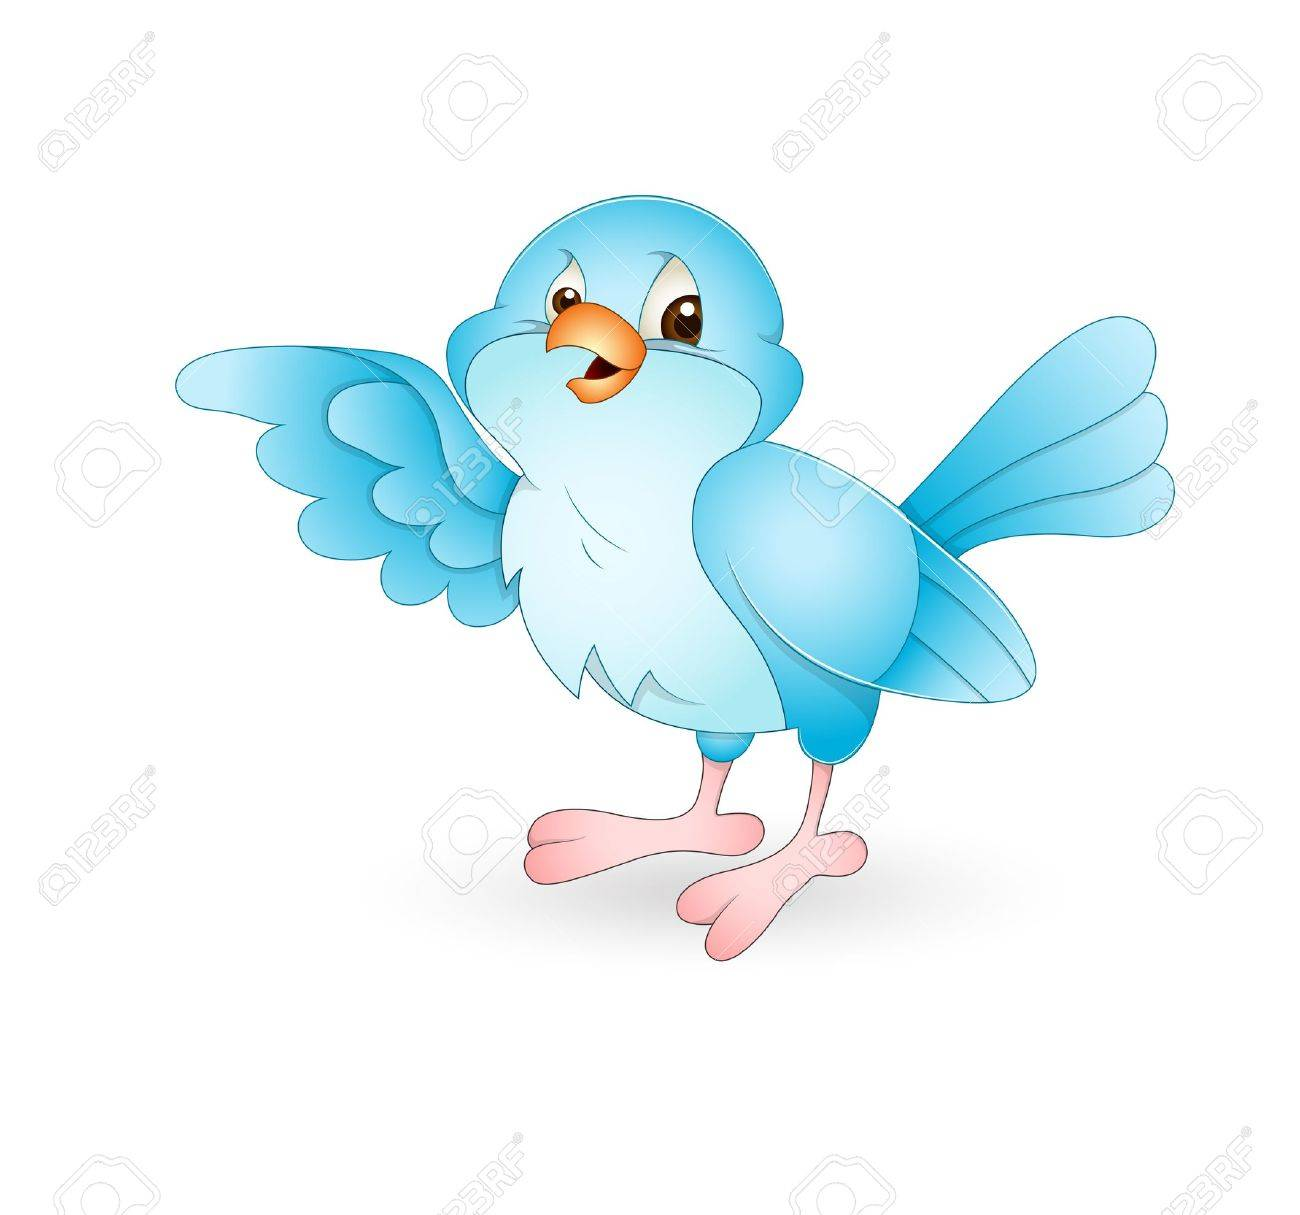 Bird Stock Vector - 13358129